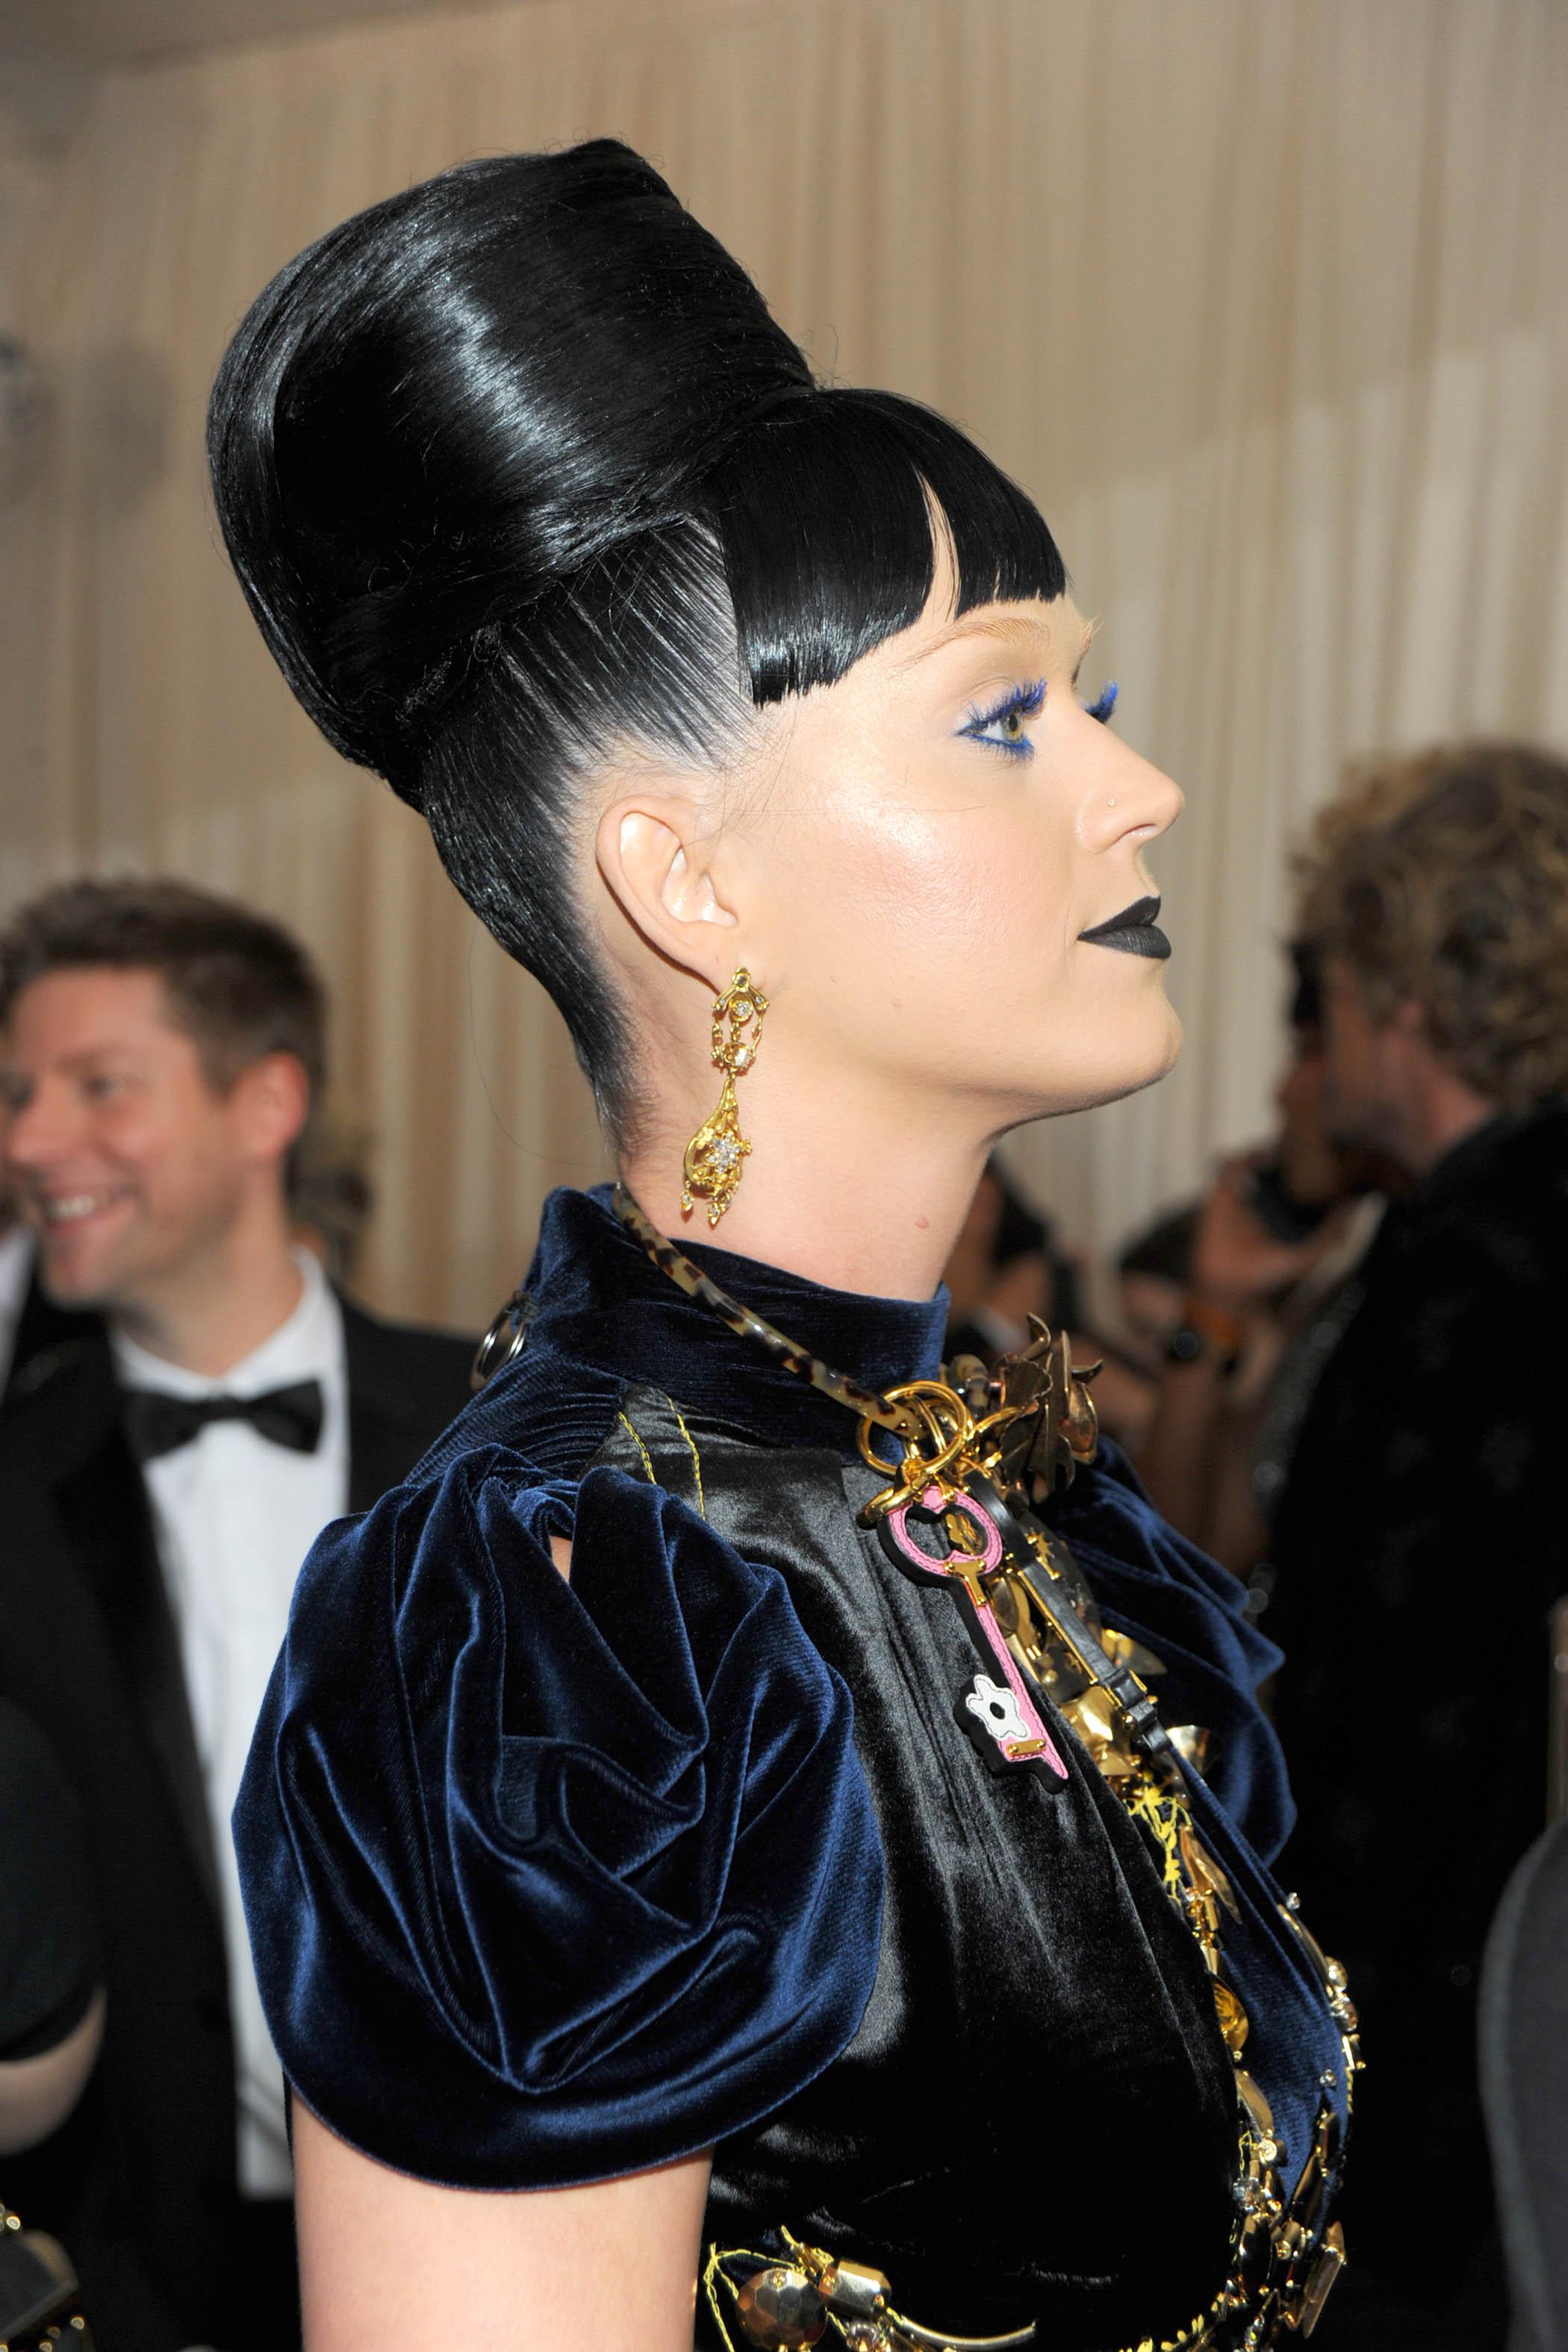 La coiffure d\u0027inspiration égyptienne de Katy Perry